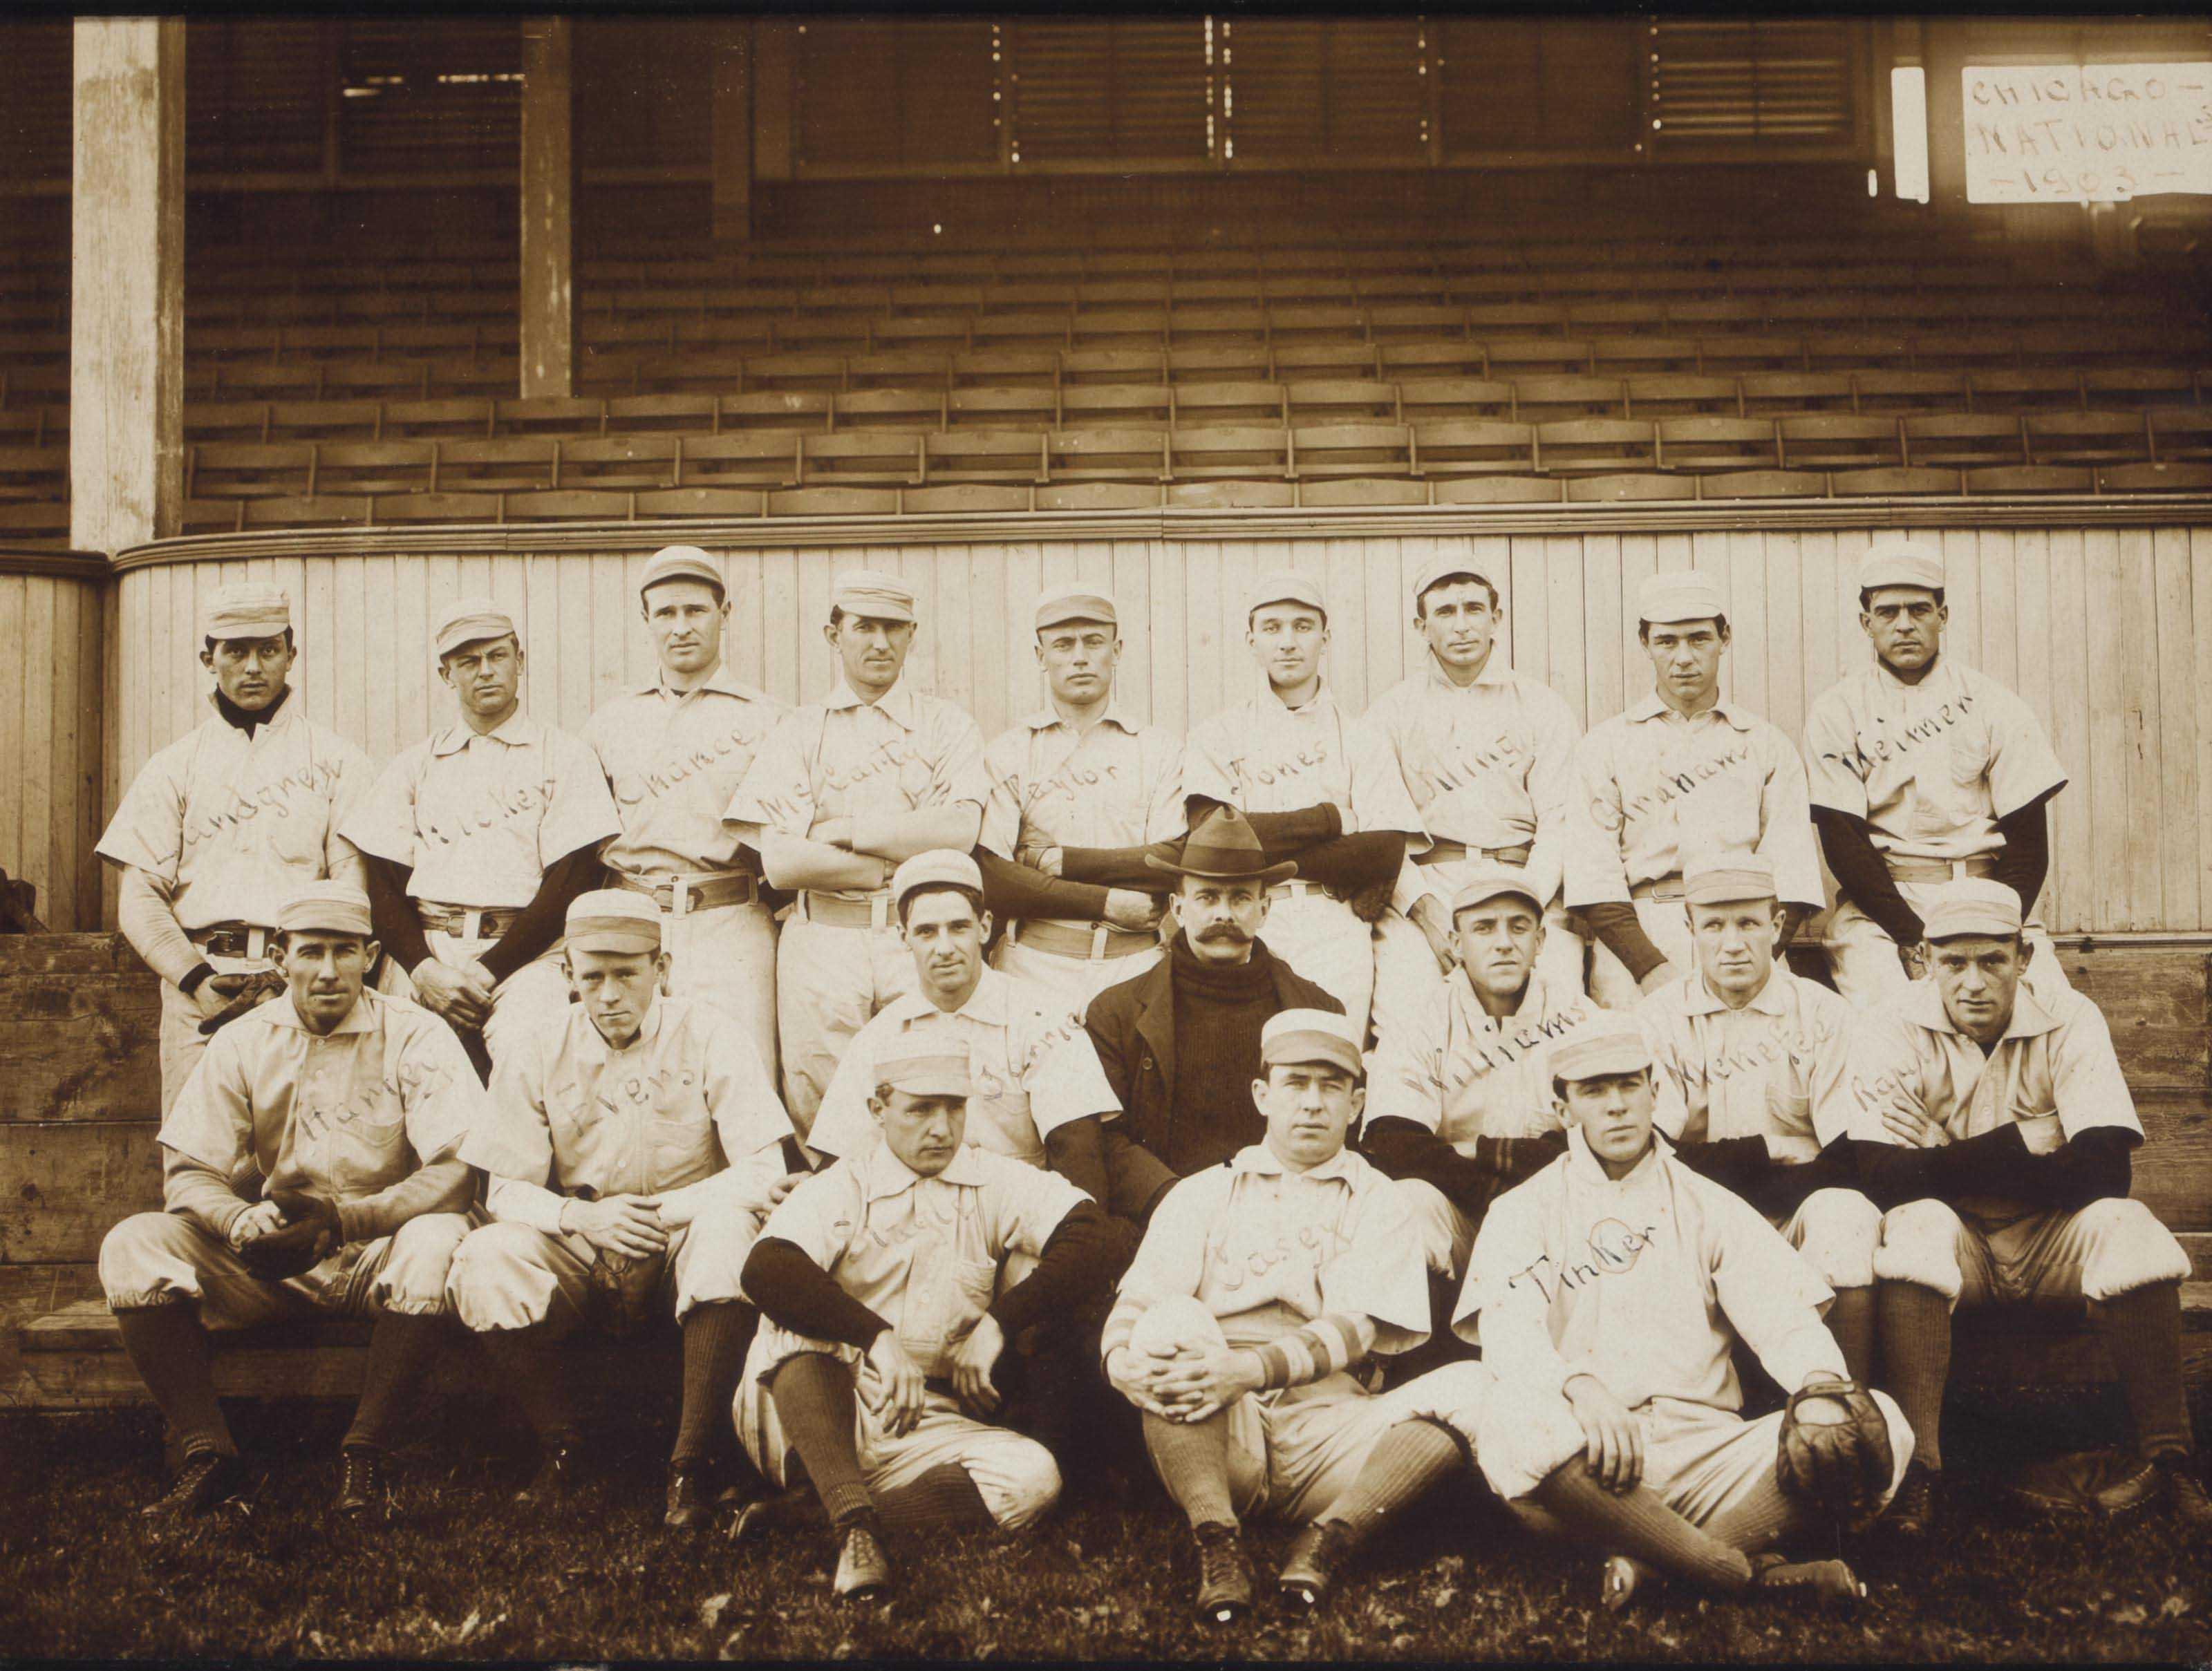 1903 CHICAGO CUBS TEAM PHOTOGR